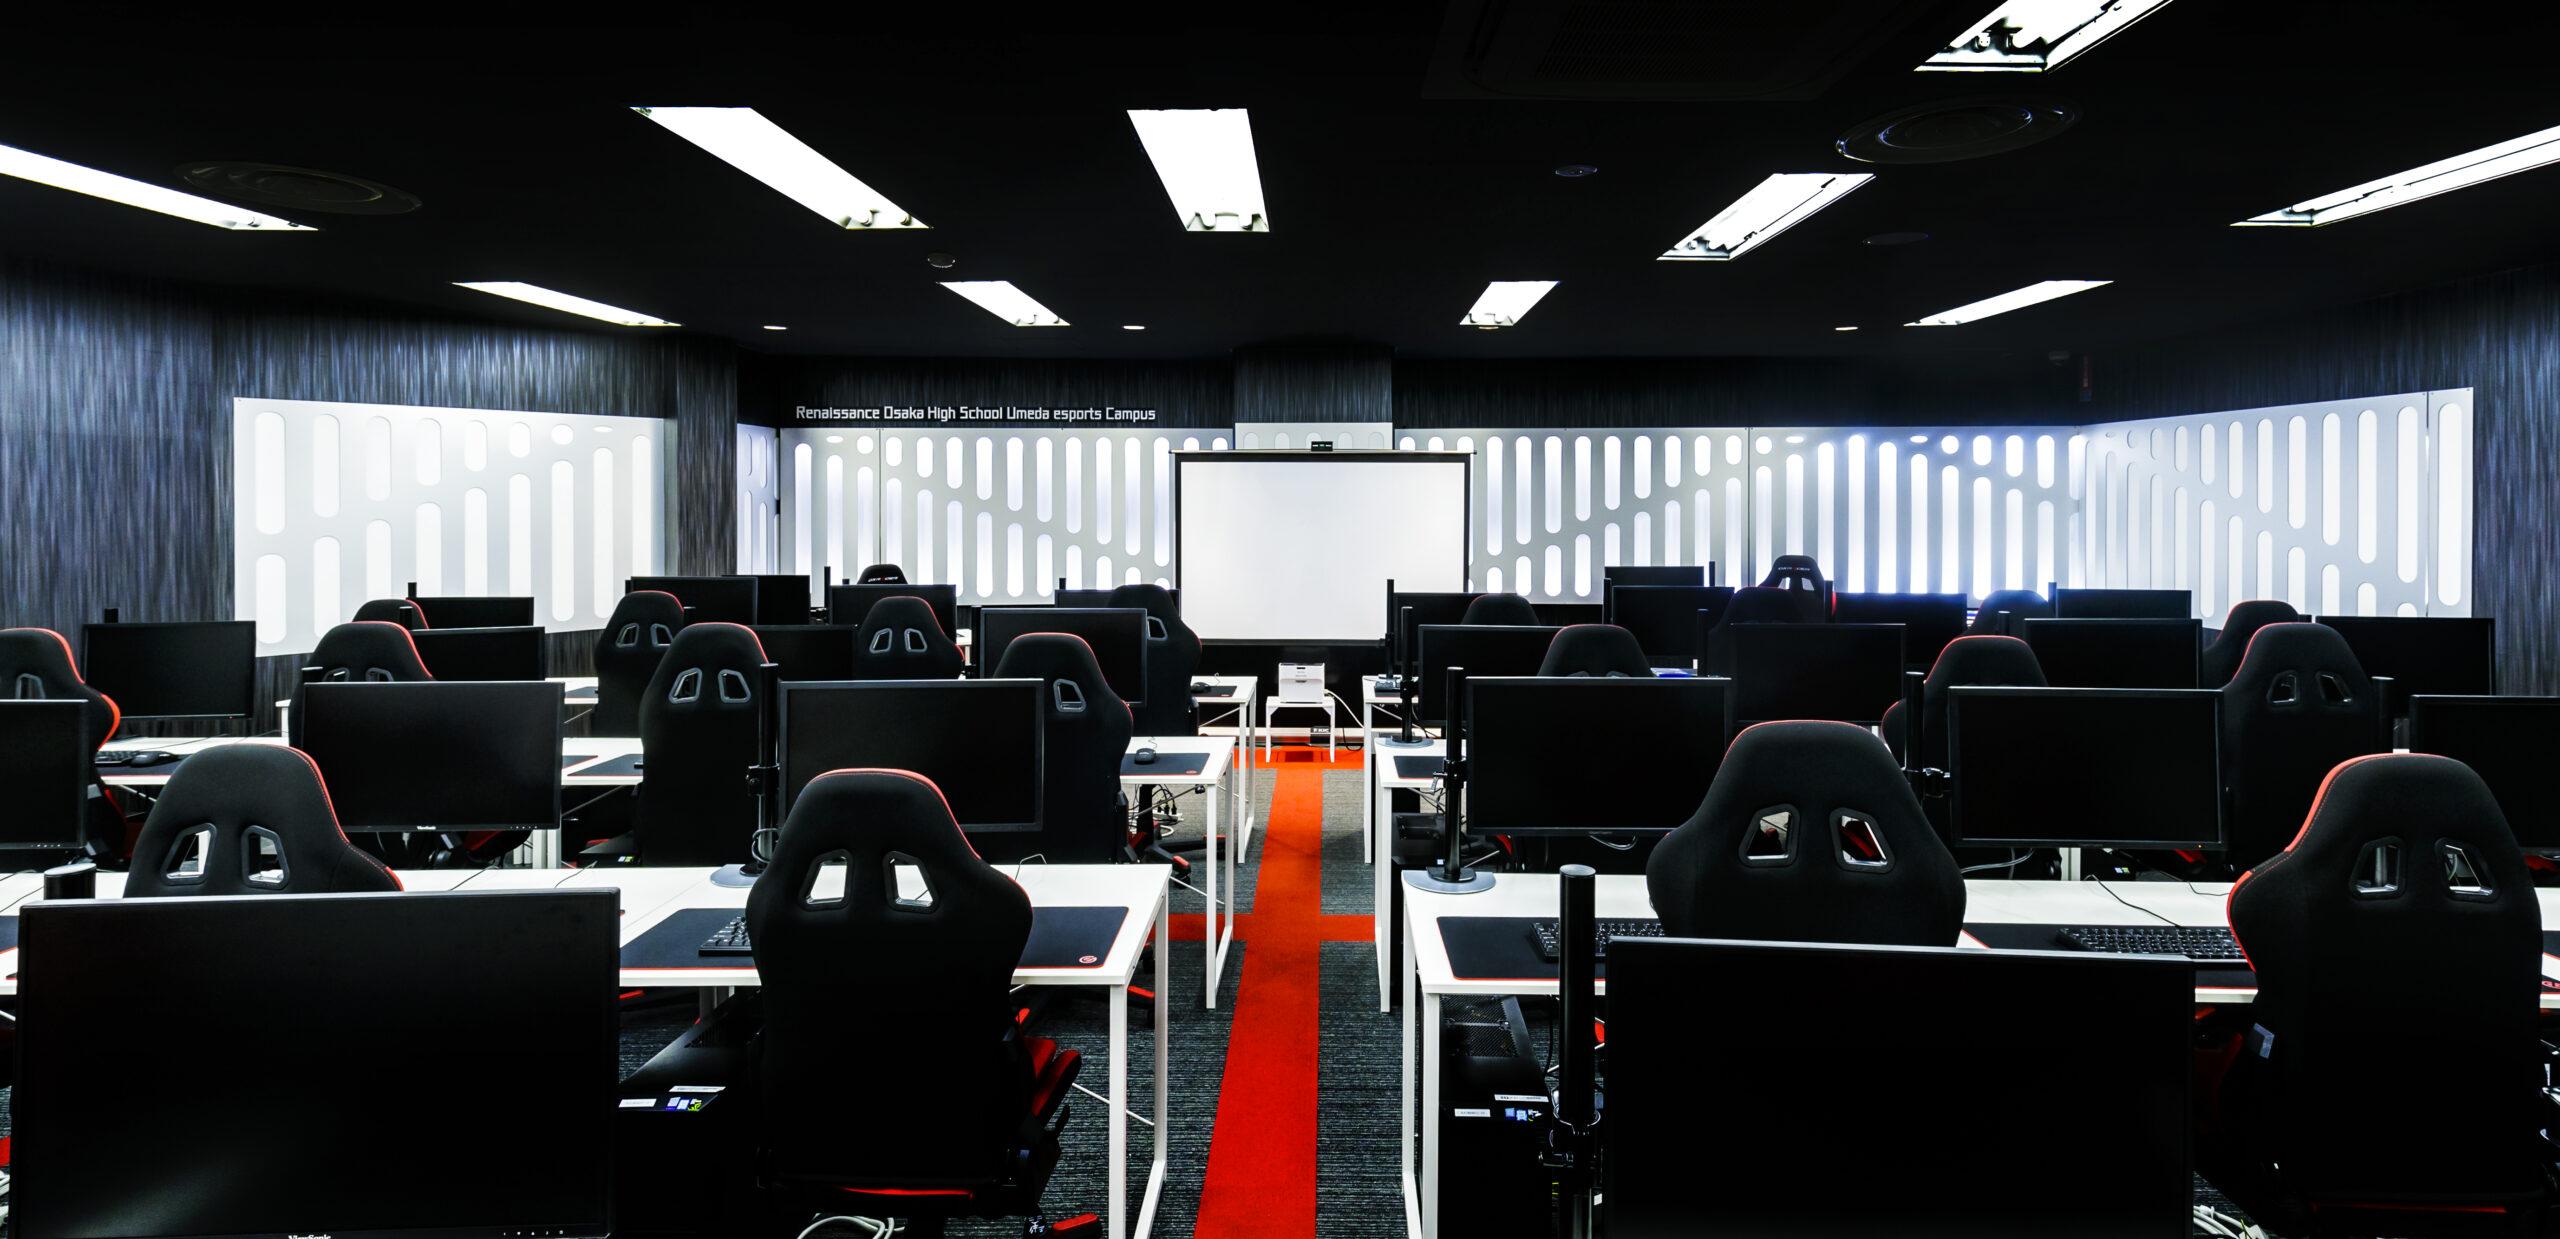 eスポーツ&プログラミング教室 ルネ中等部 大阪キャンパス